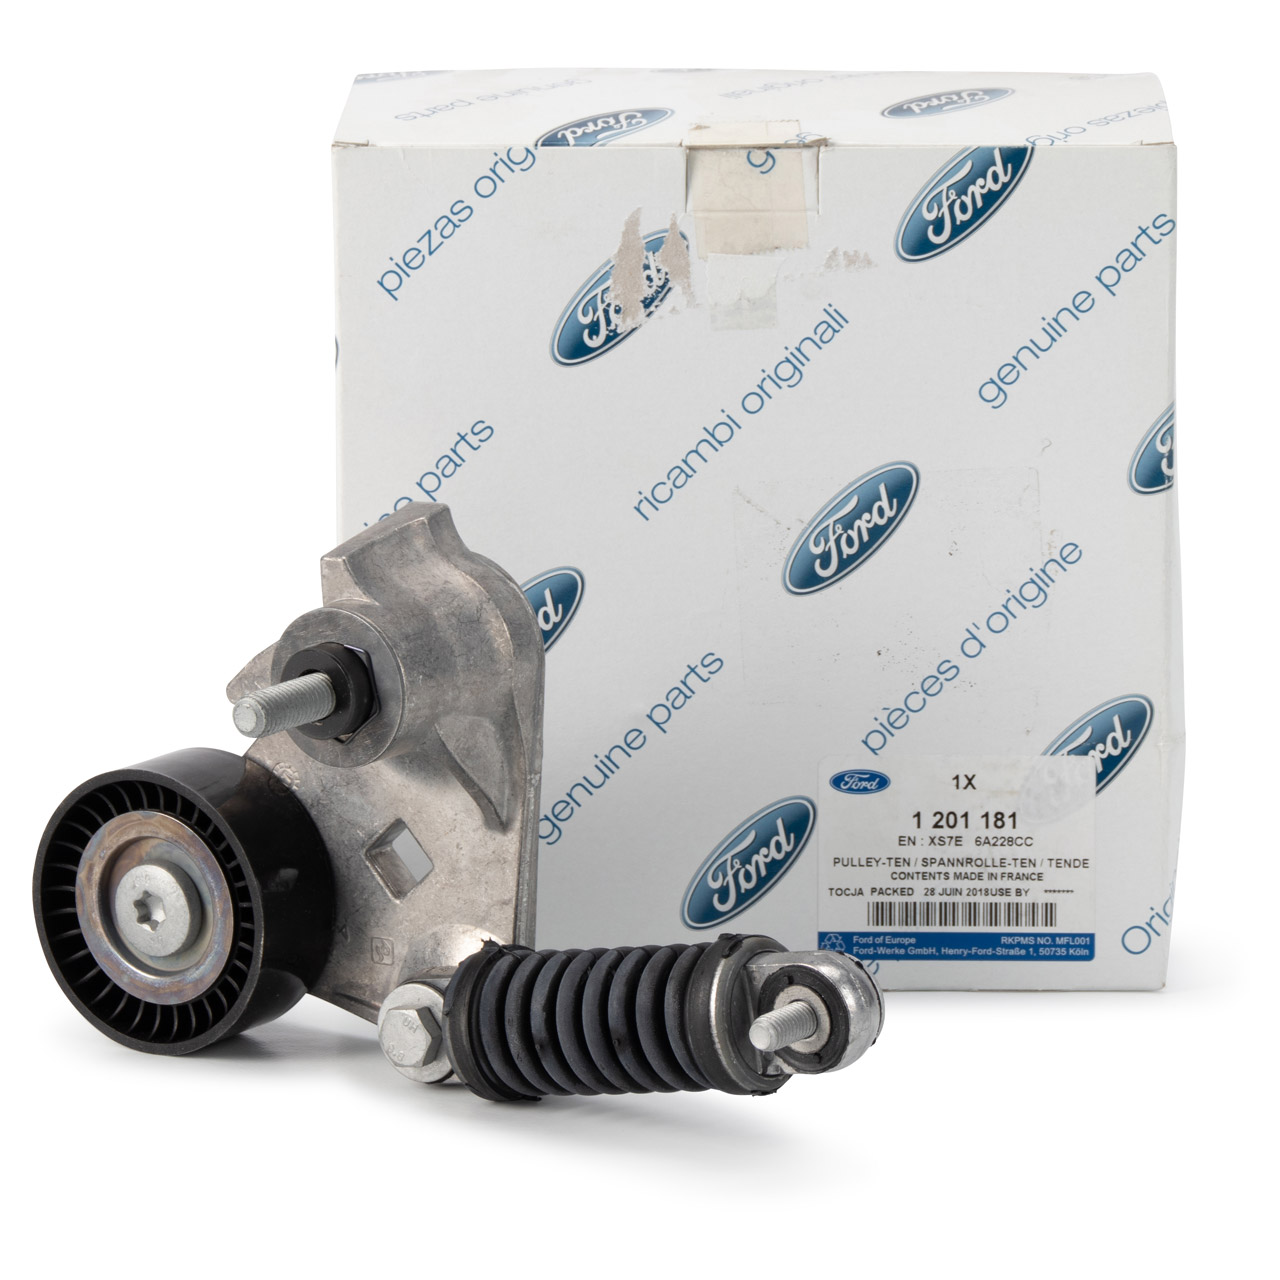 ORIGINAL Ford Riemenspanner Keilrippenriemen MONDEO III MK3 2.0TDCi 1201181